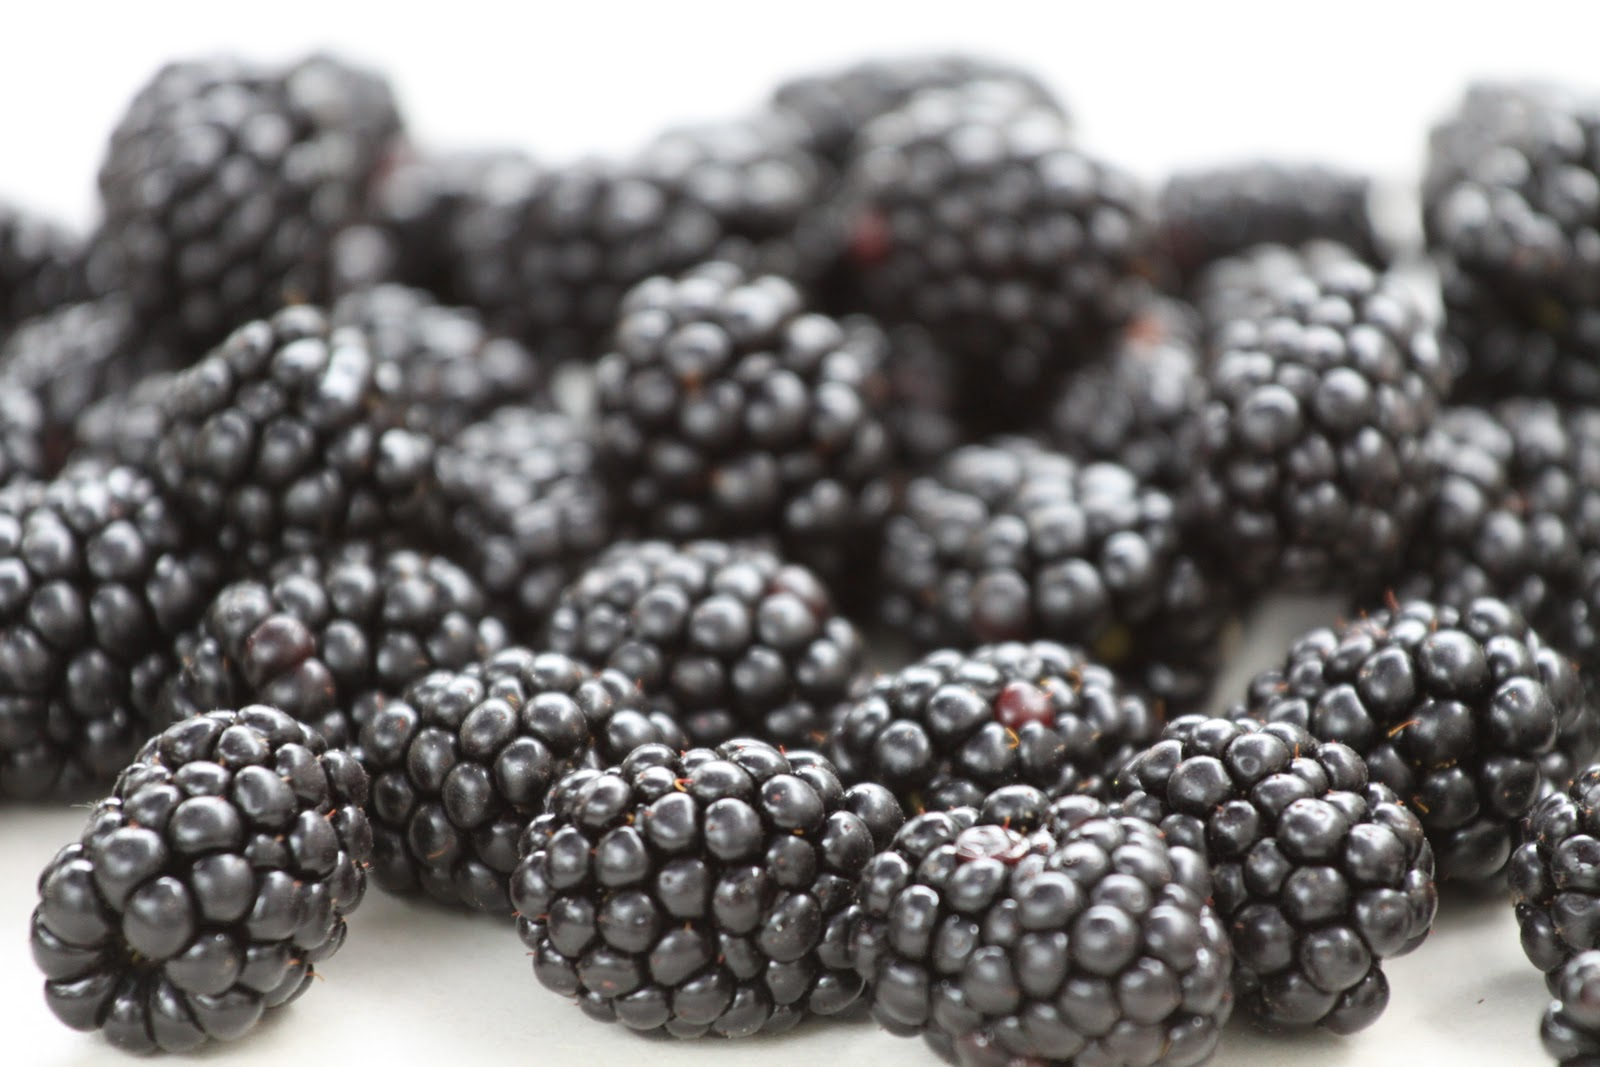 Blackberry Upside Down Cake Recipe